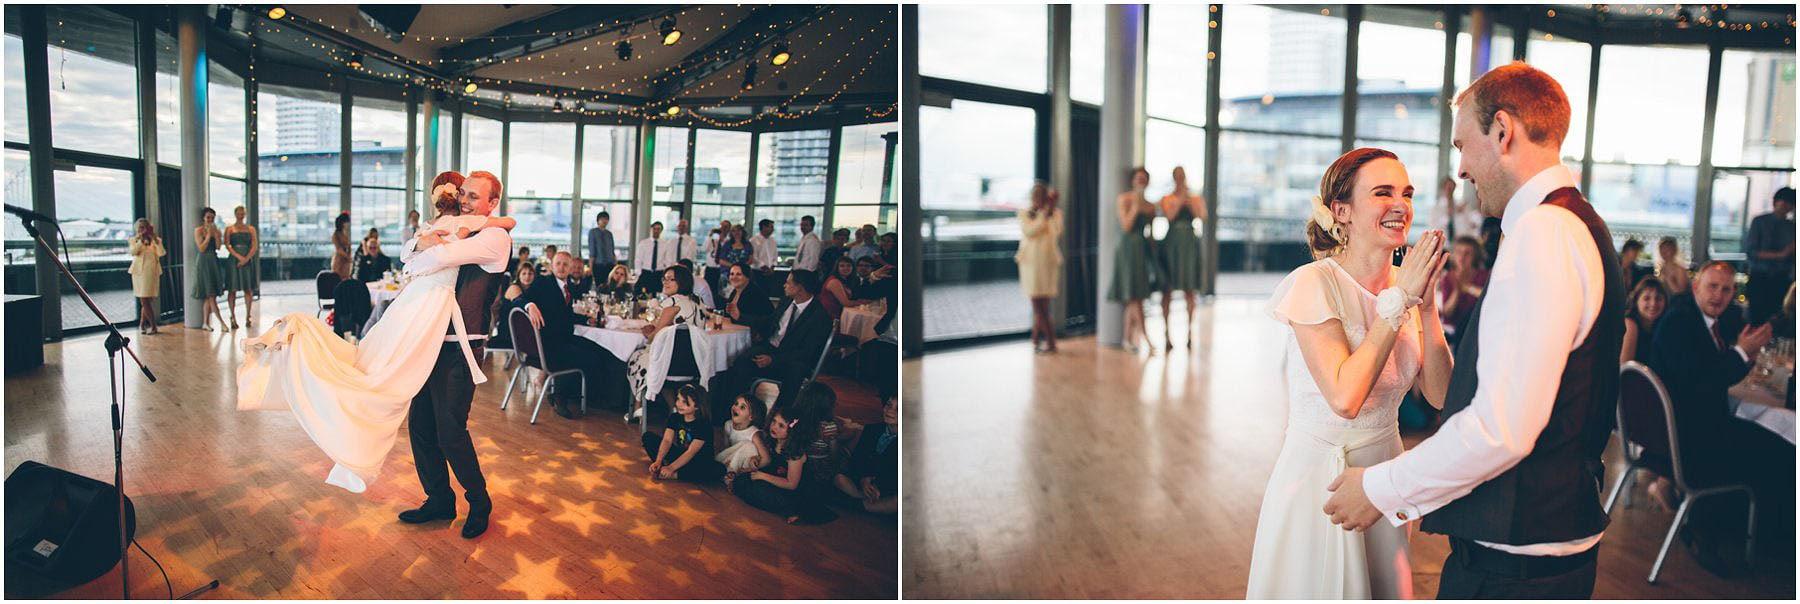 Lowry_Theatre_Wedding_Photography_0142